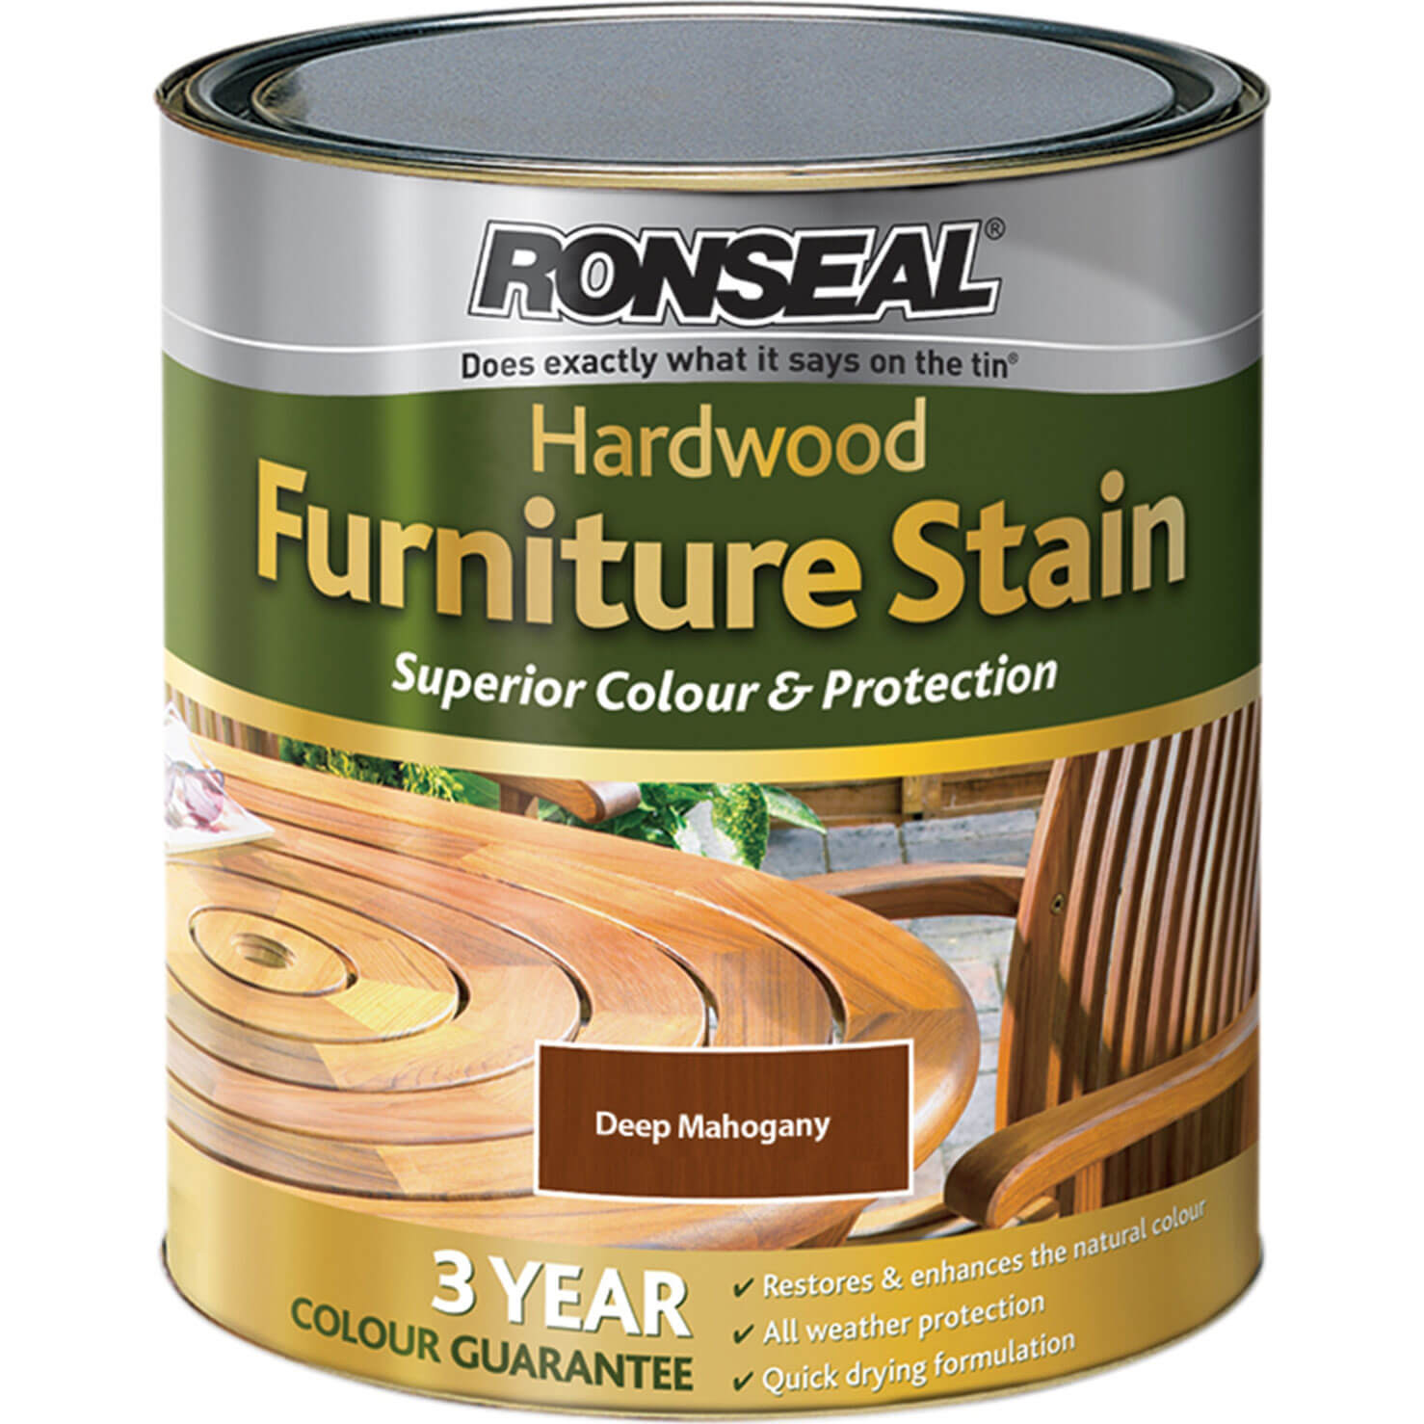 Ronseal Hardwood Furniture Stain Deep Mahogany 750ml